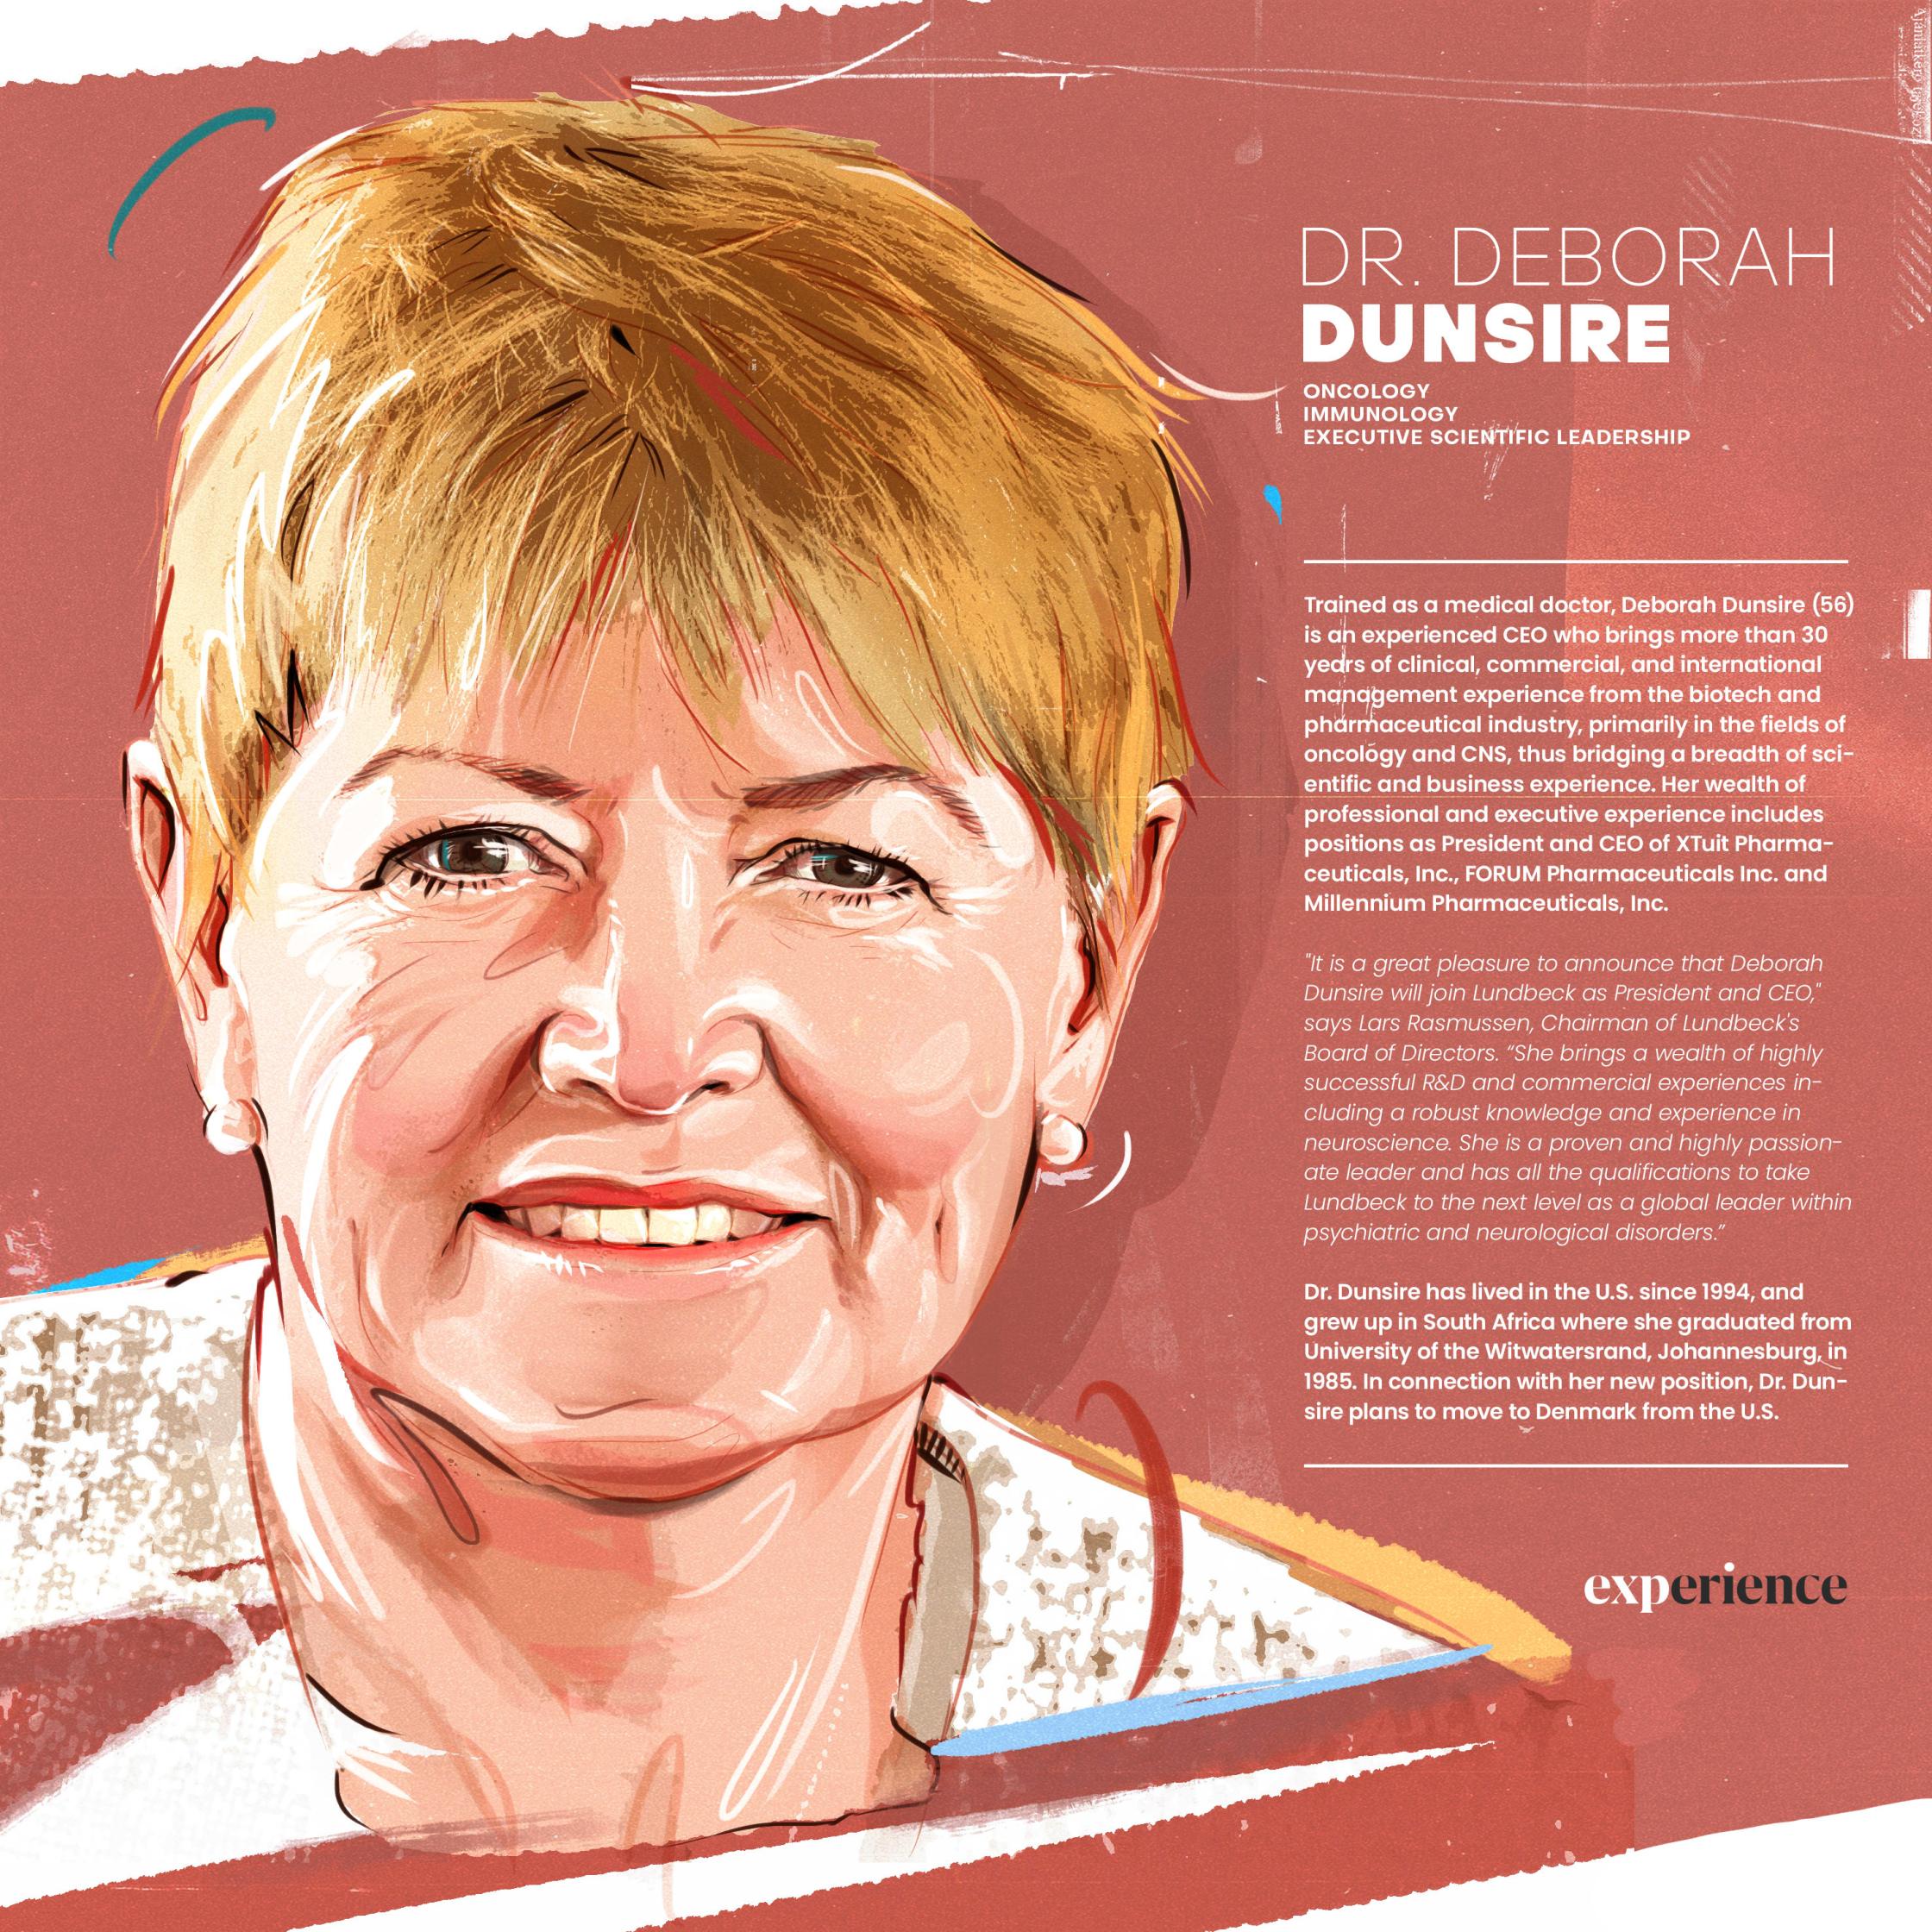 Deborah Dunsire portret.jpg